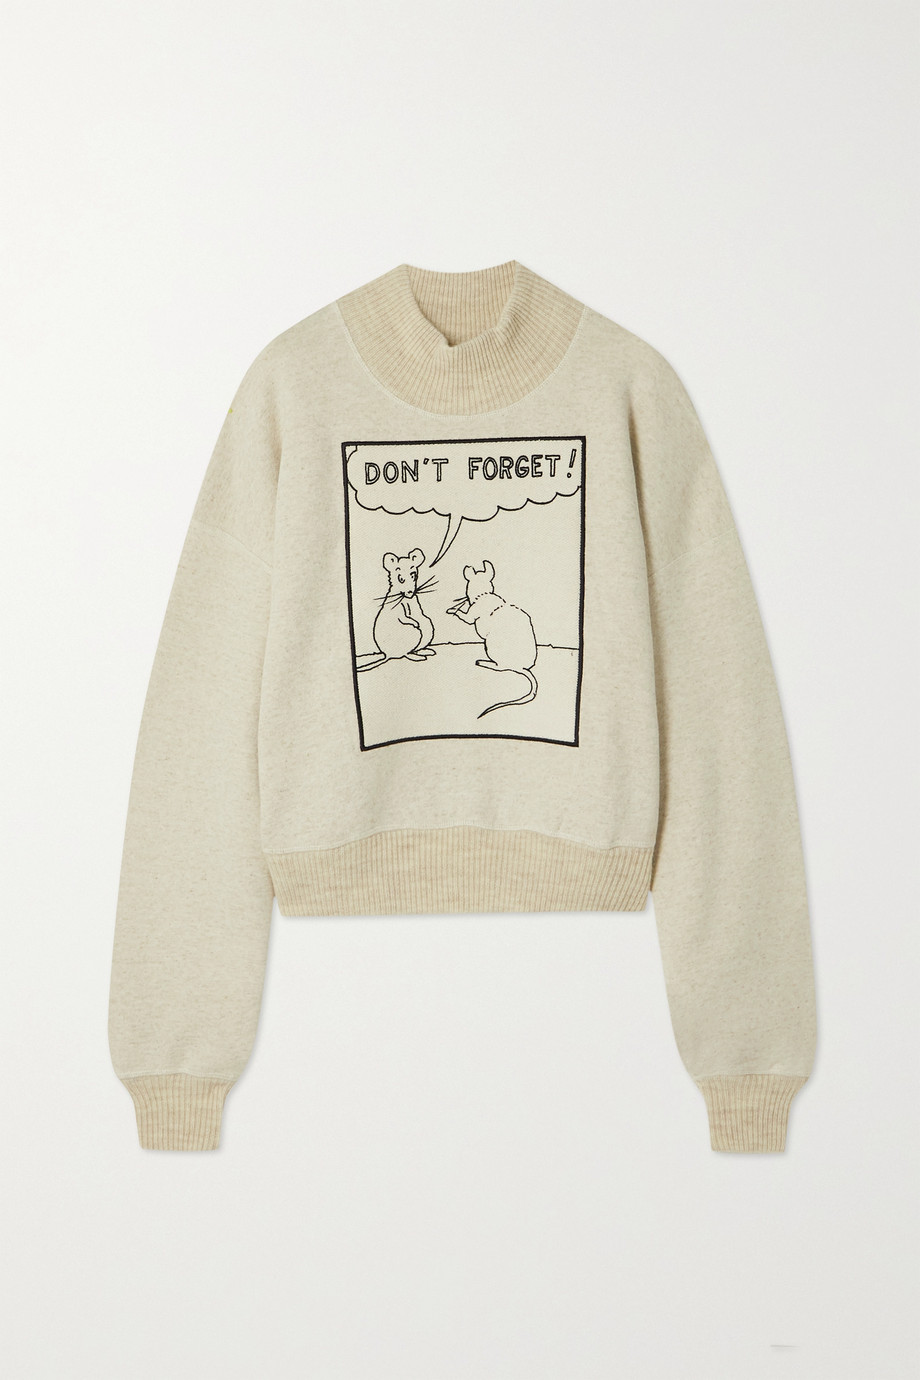 Loewe + Joe Brainard appliquéd jersey turtleneck sweatshirt